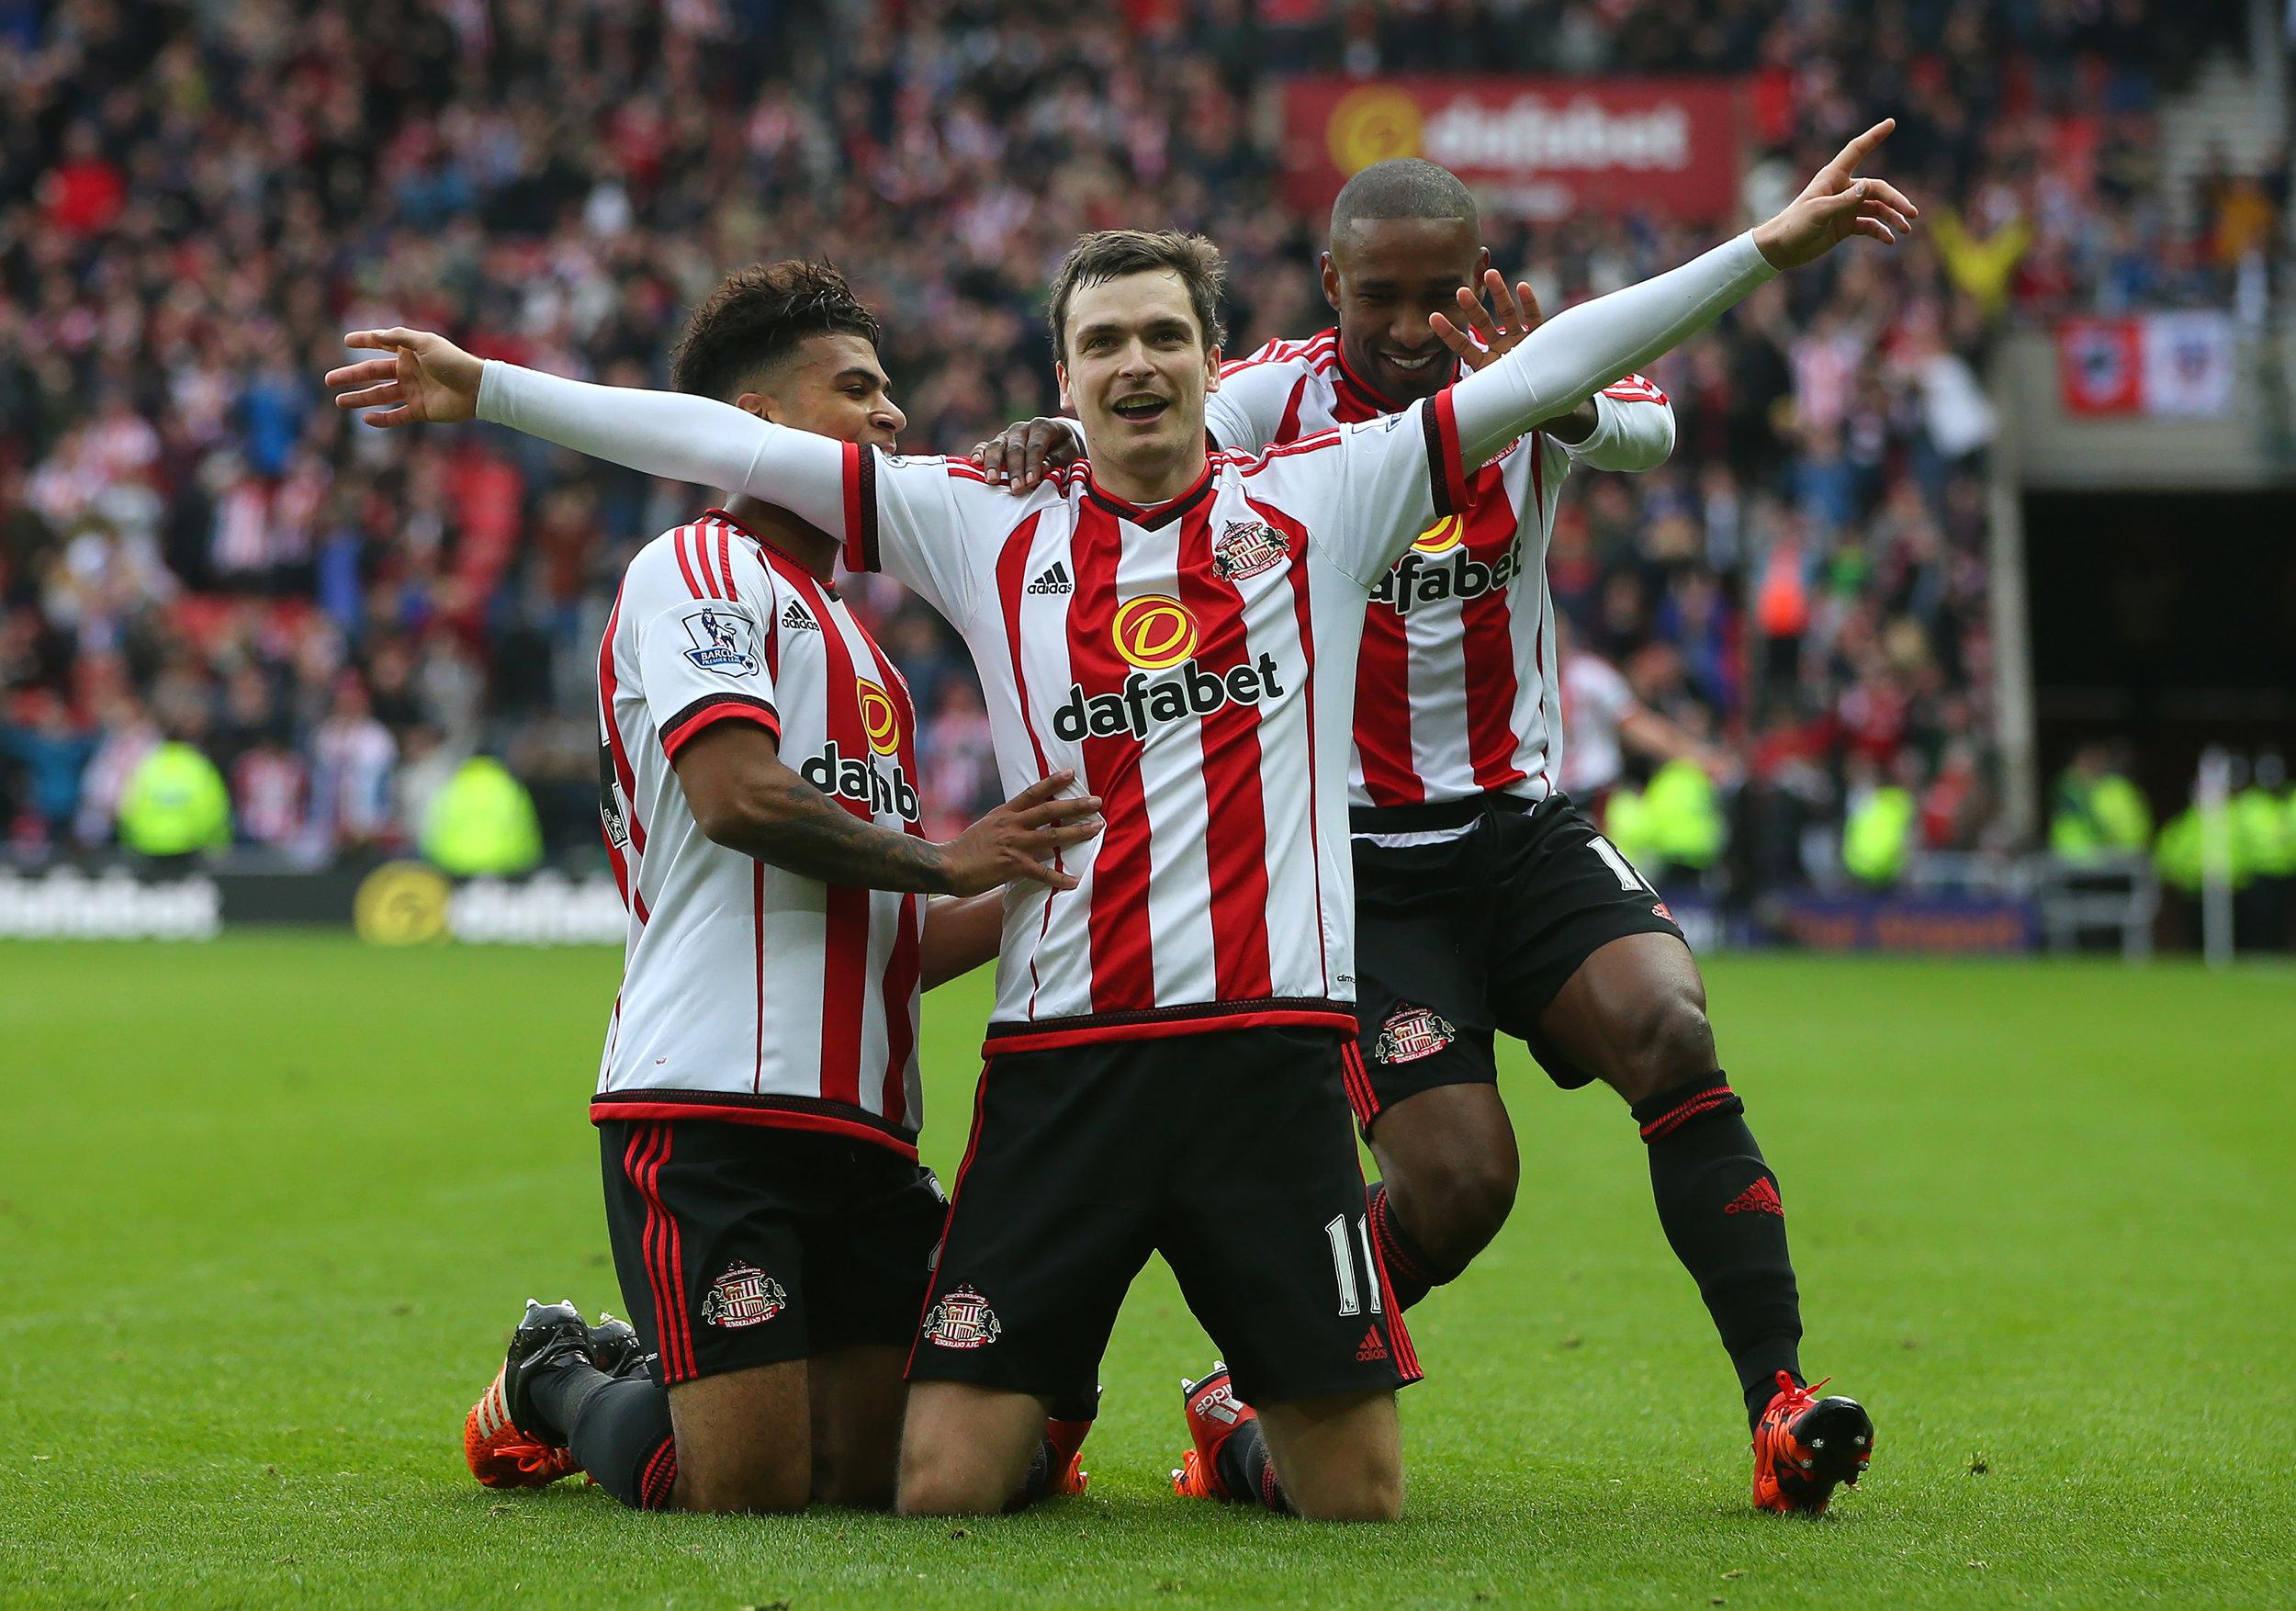 Adam Johnson har scoret mod Newcastle. Foto: Getty Images/Ian MacNicol